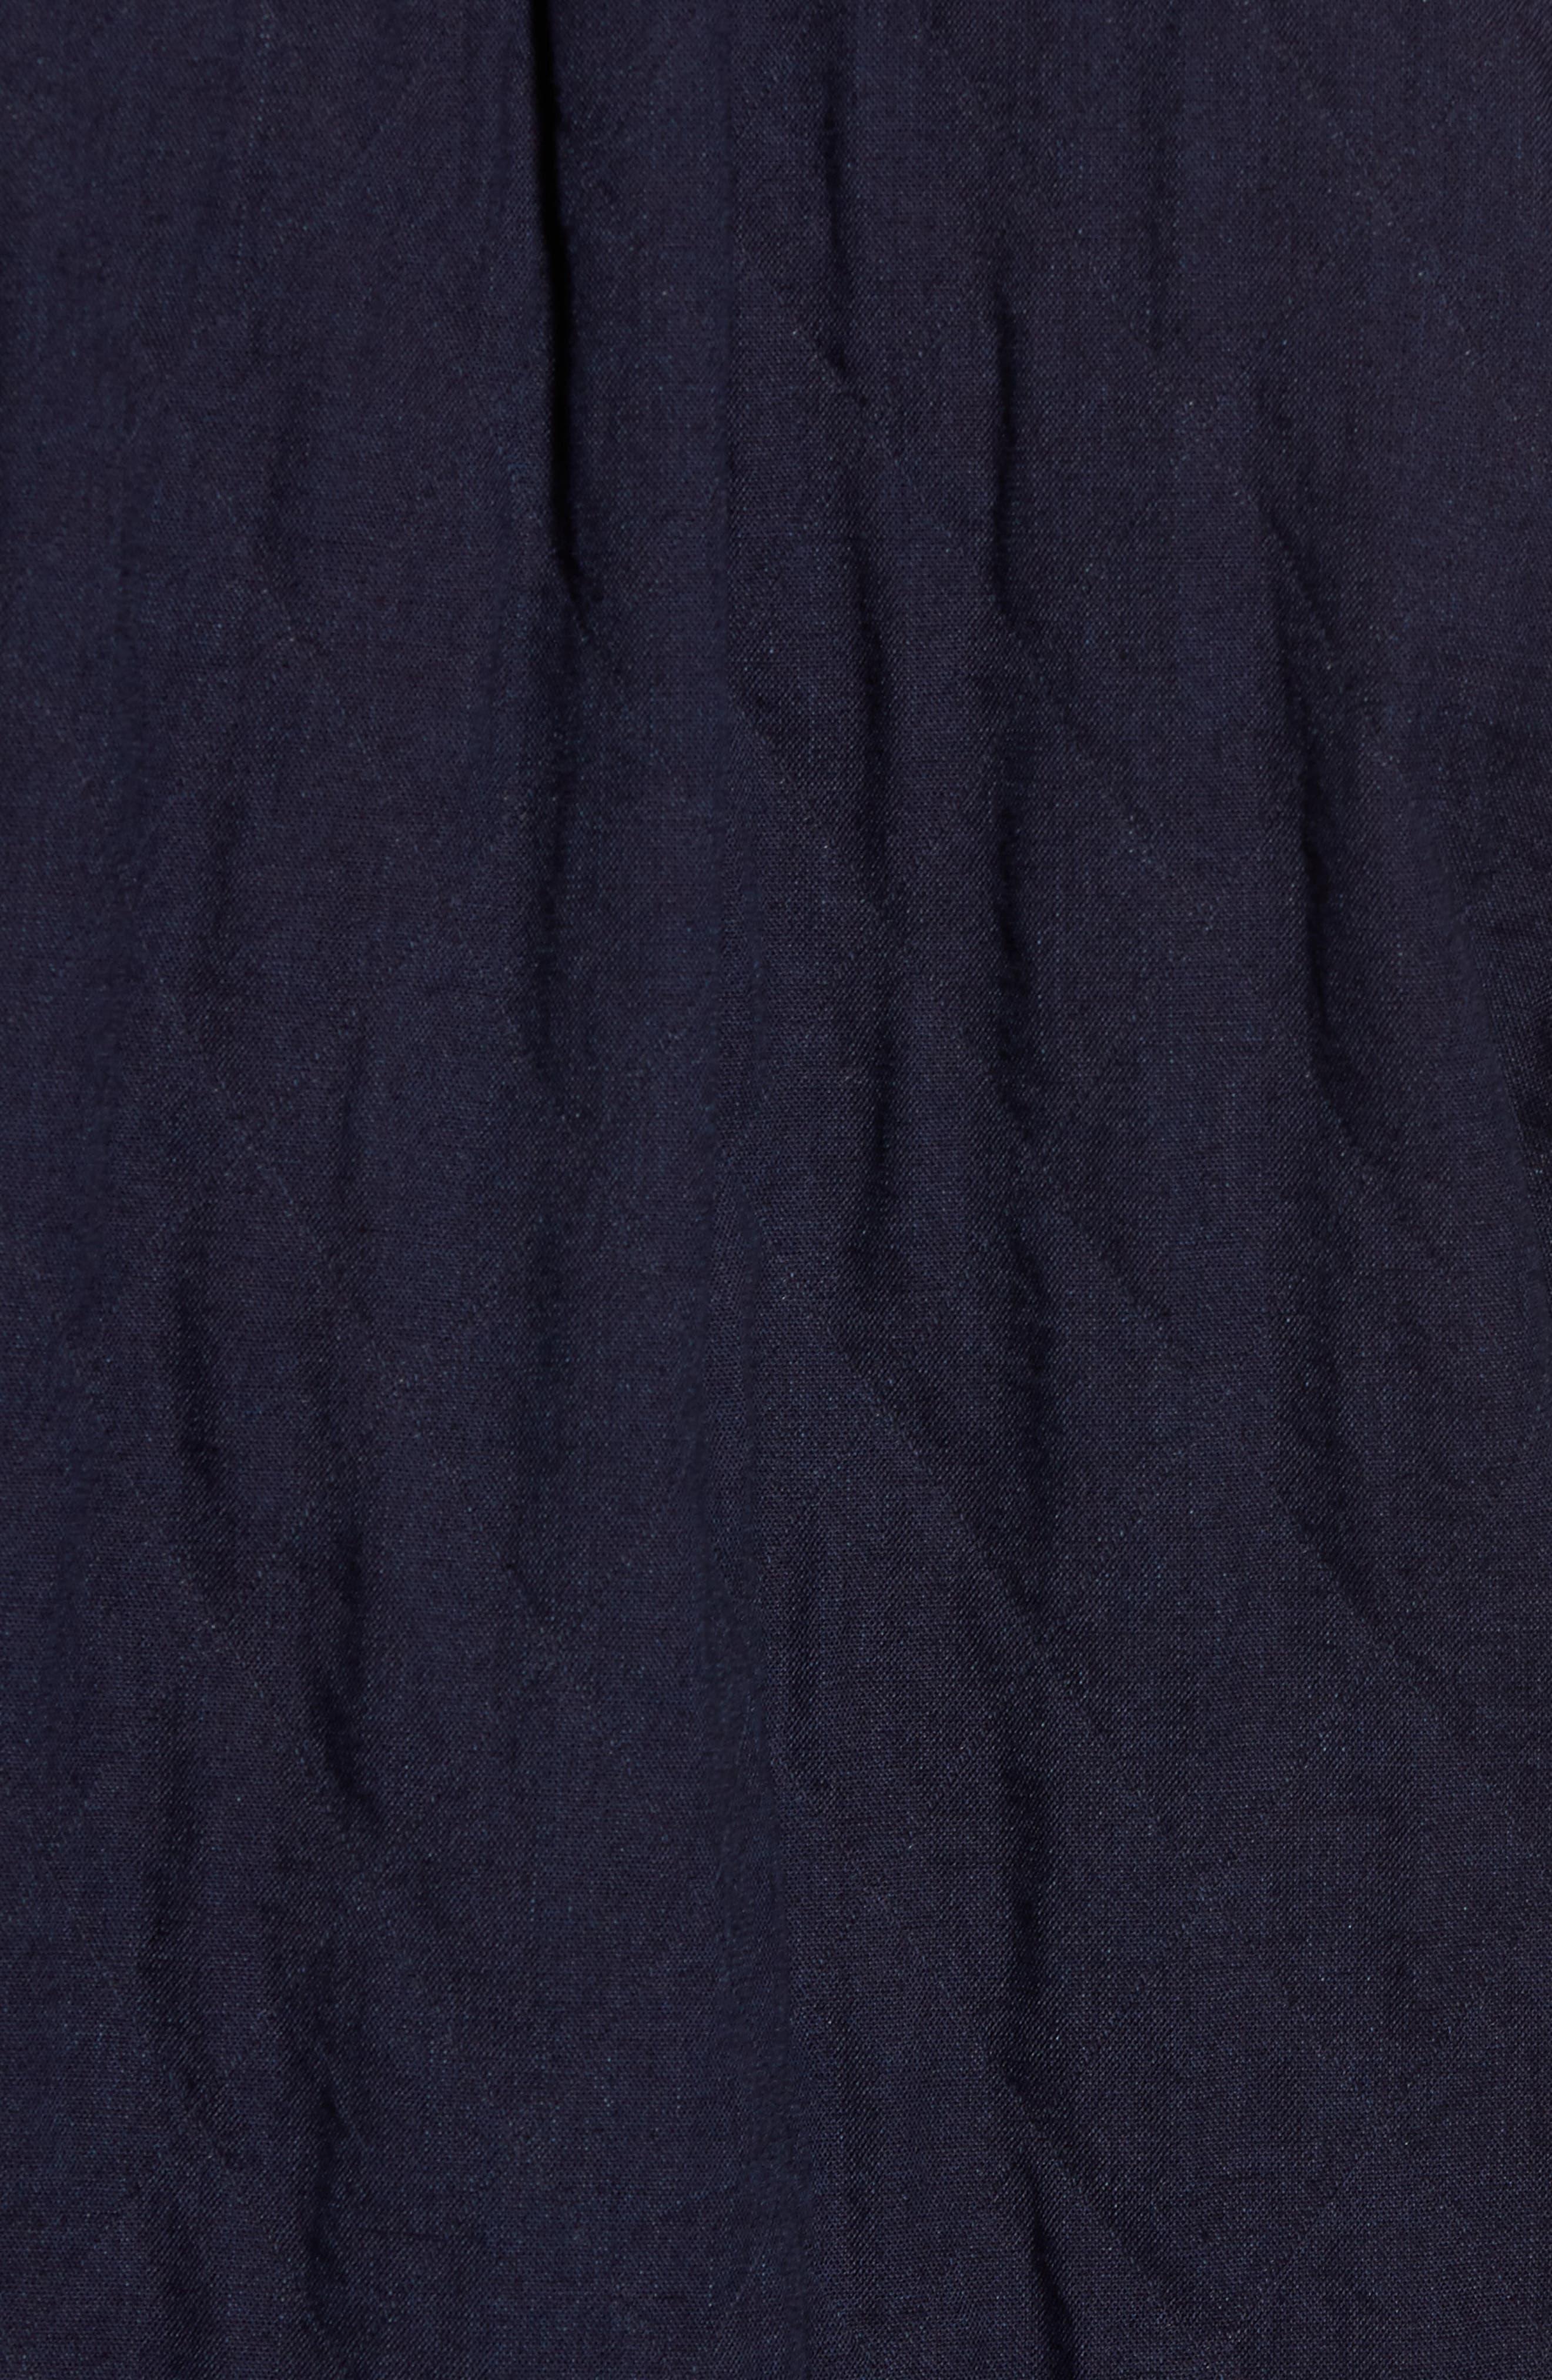 Double Weave Overshirt,                             Alternate thumbnail 5, color,                             401